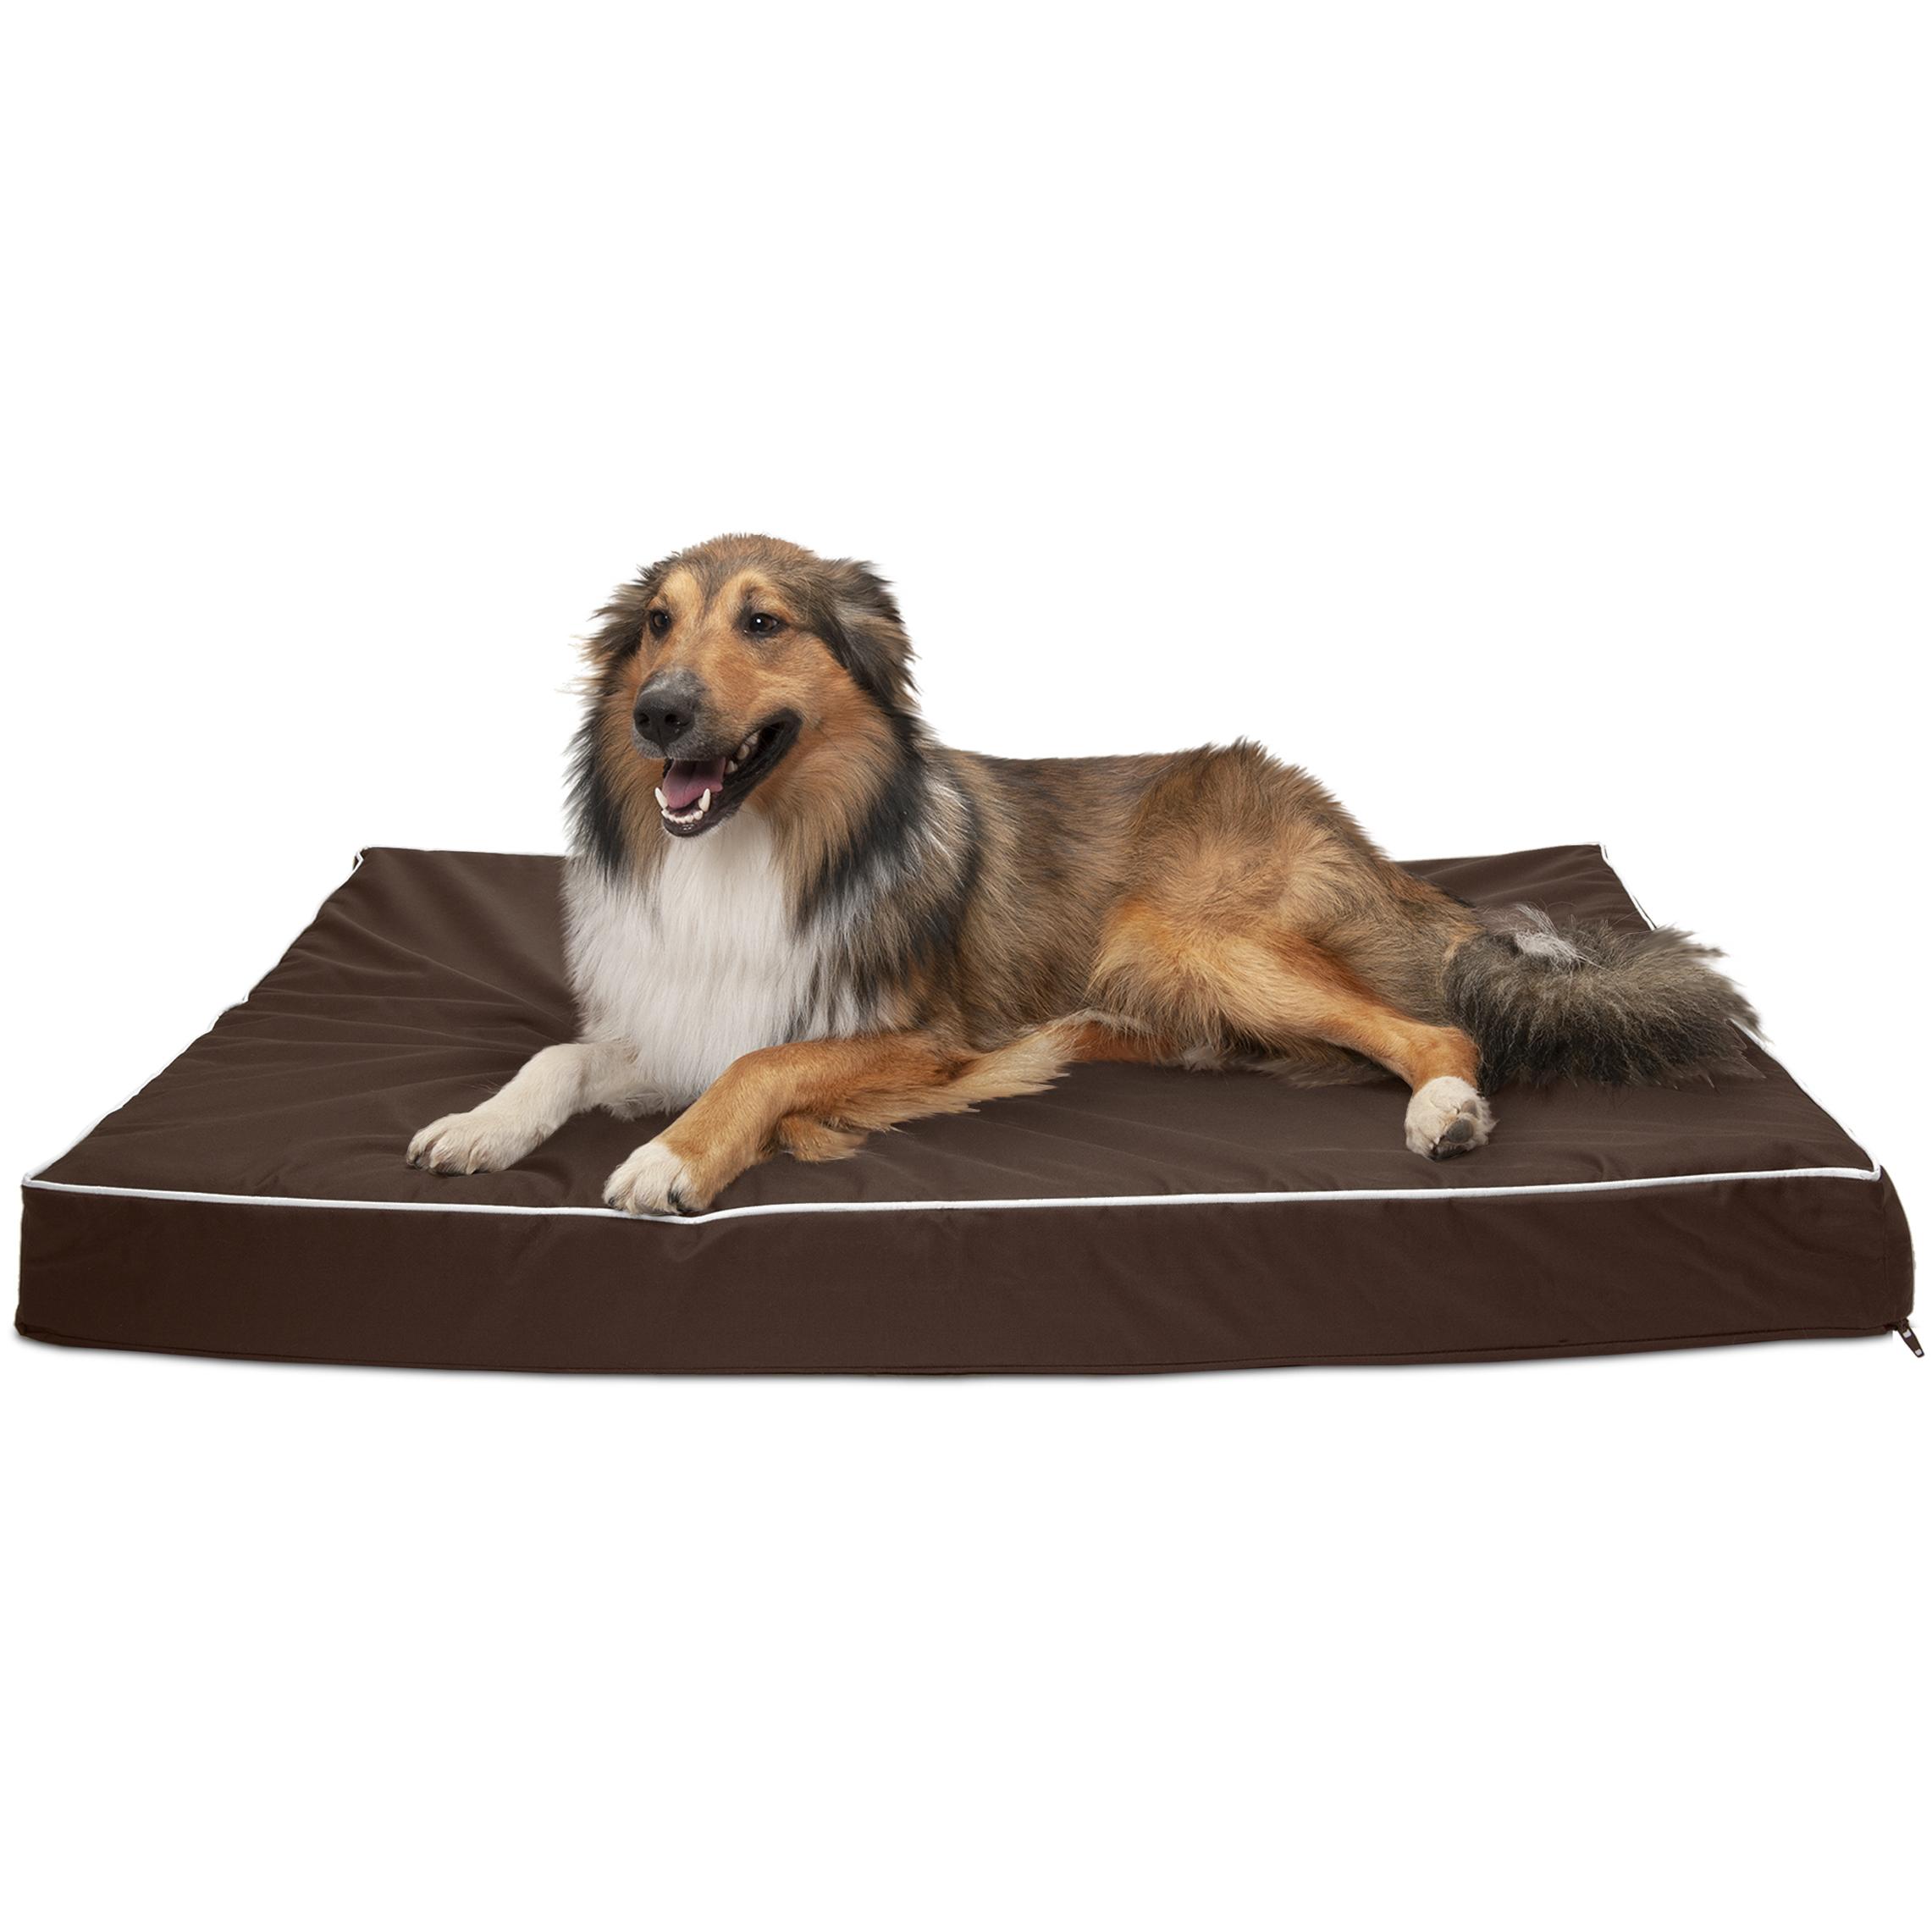 FurHaven Pet Dog Bed | Cooling Gel Memory Foam Orthopedic Indoor/Outdoor Mattress Pet Bed for Dogs & Cats, Solid Espresso, Jumbo